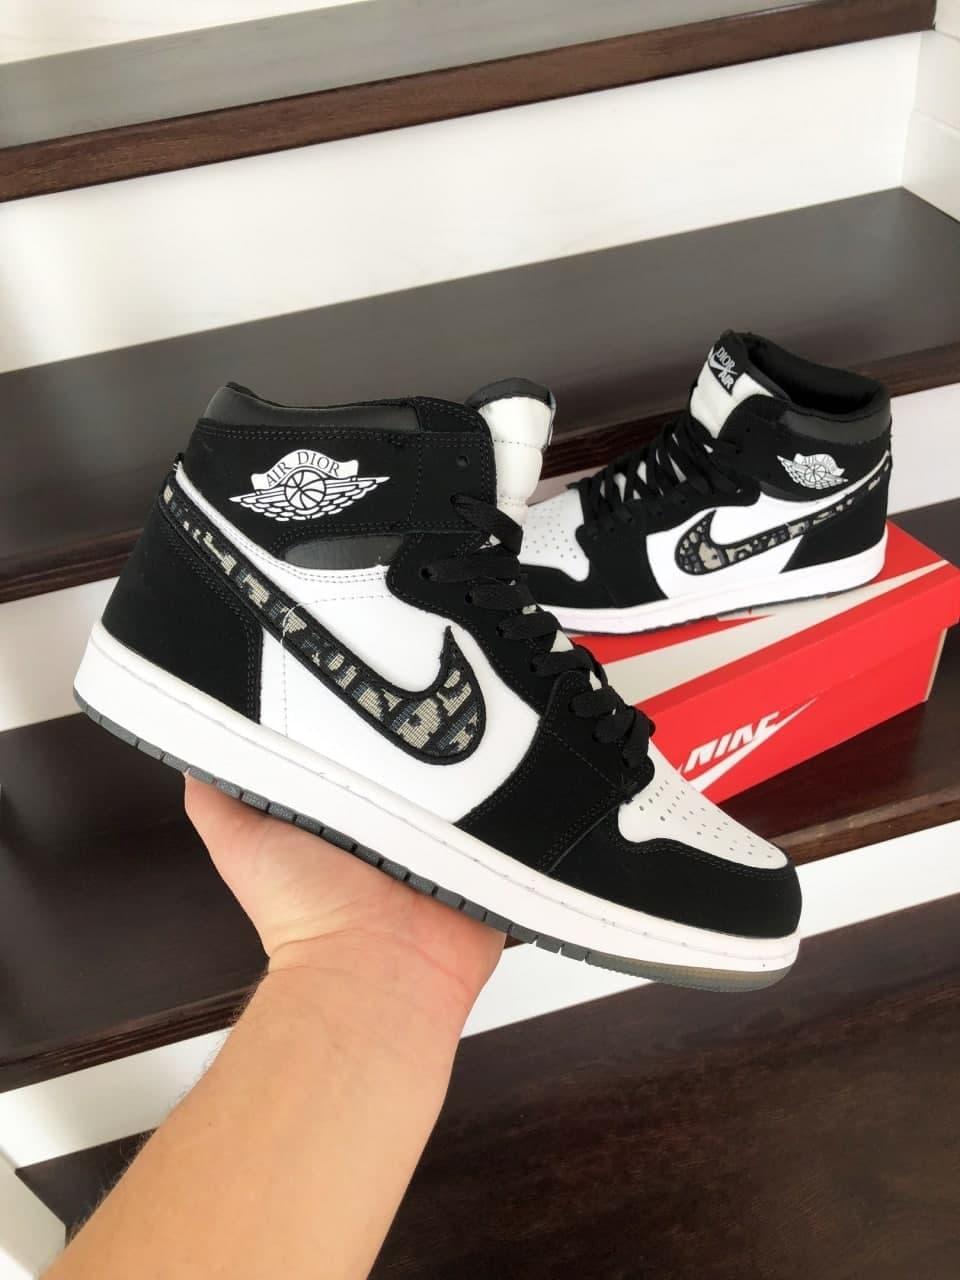 Кроссовки Nk ir Jordan  1 Dior Black/White 41 42 43 44 45 46